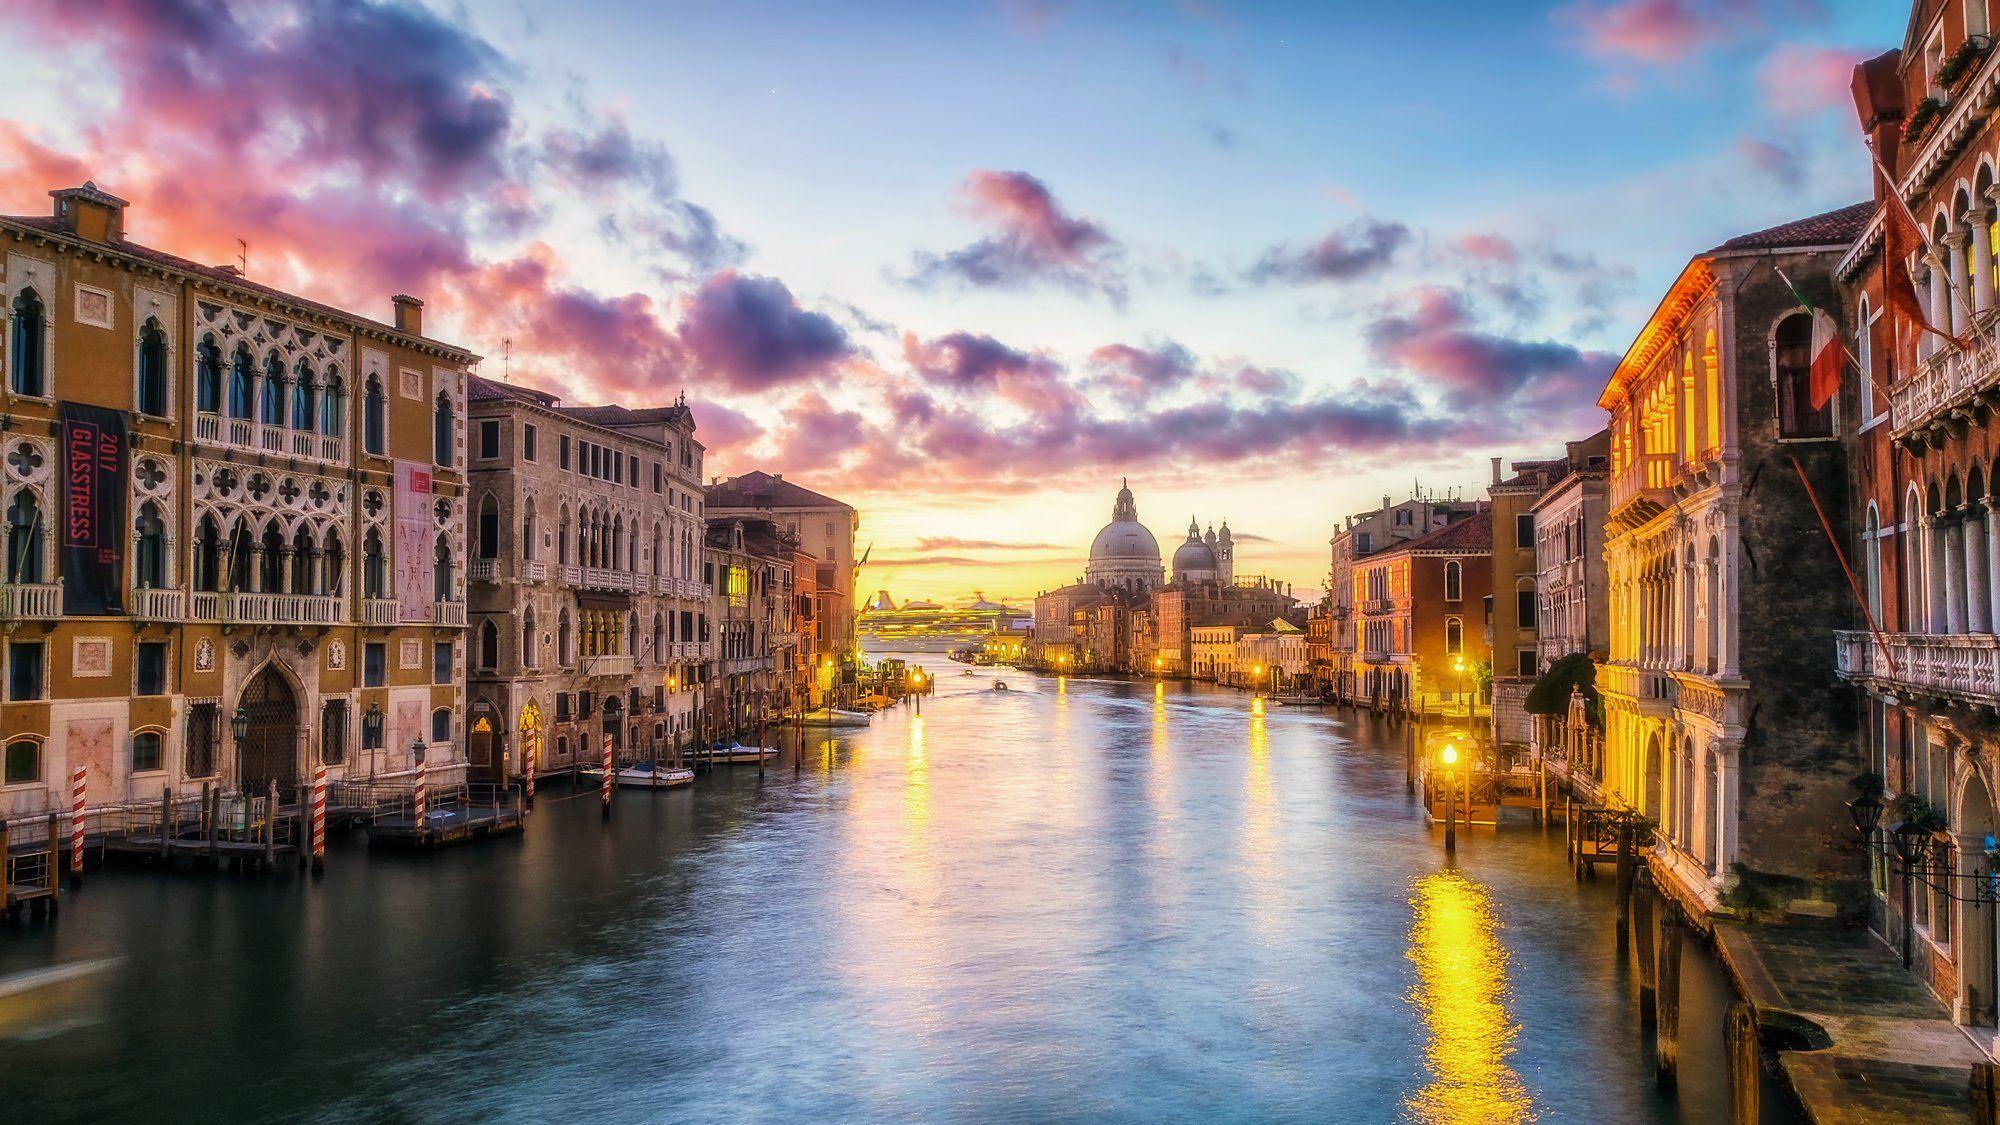 #italia #италия #венеция, Arthur Cross